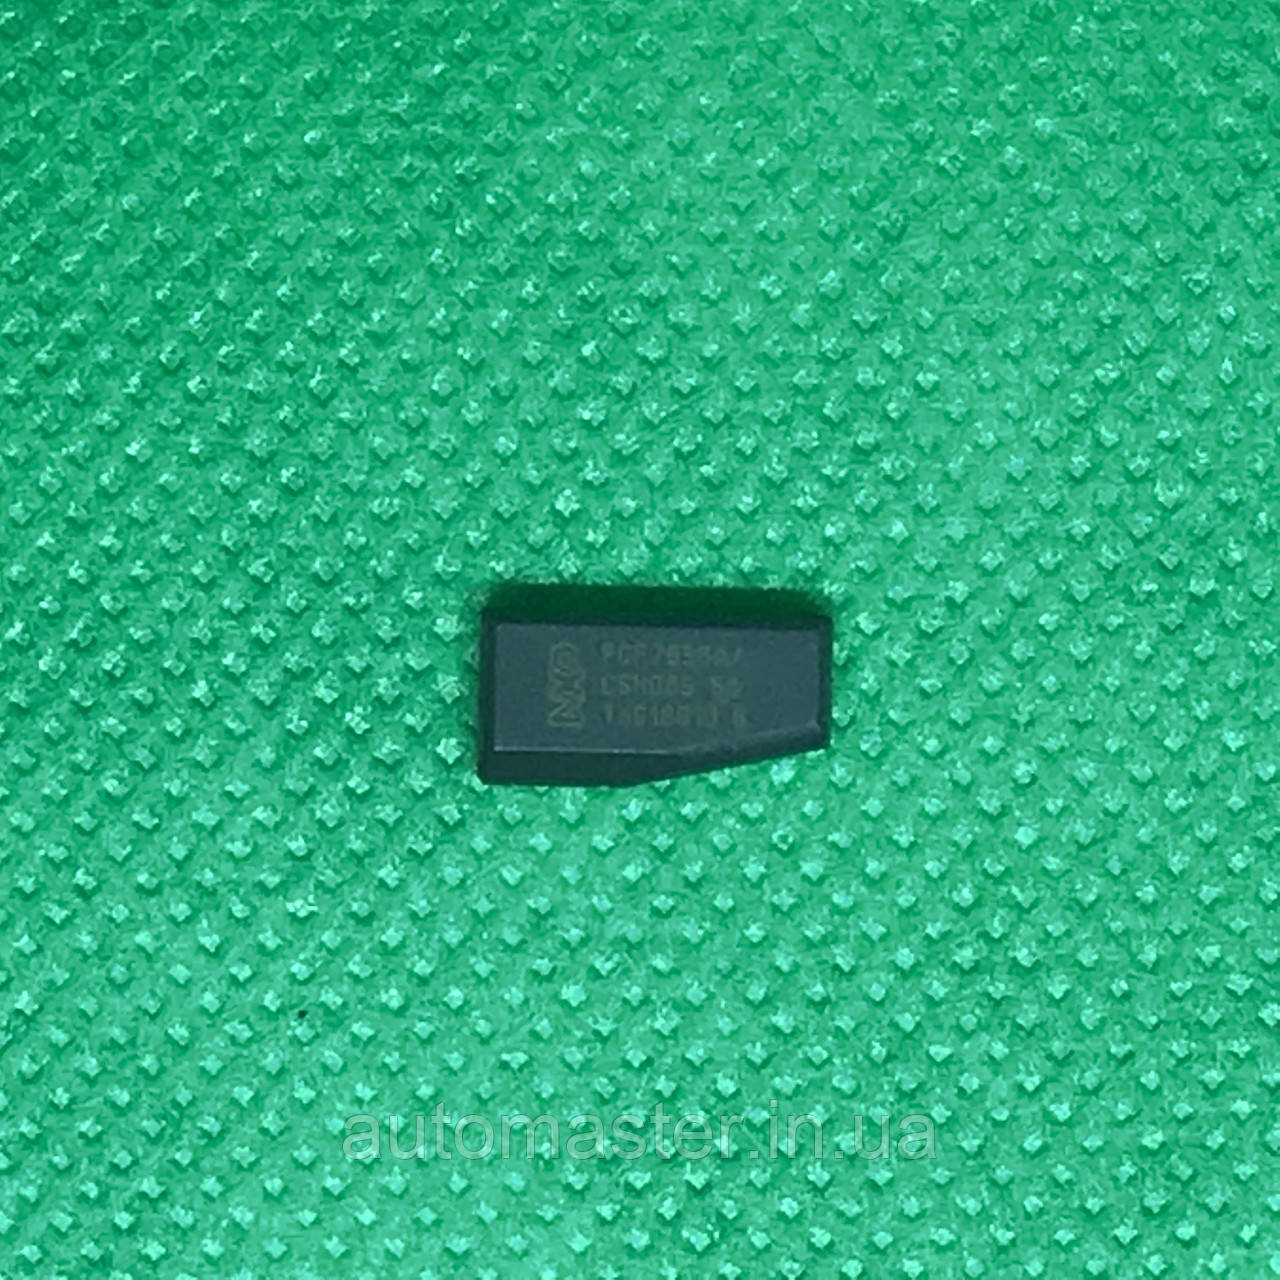 Чип транспондер ID 46 locked для Chrysler Крайслер